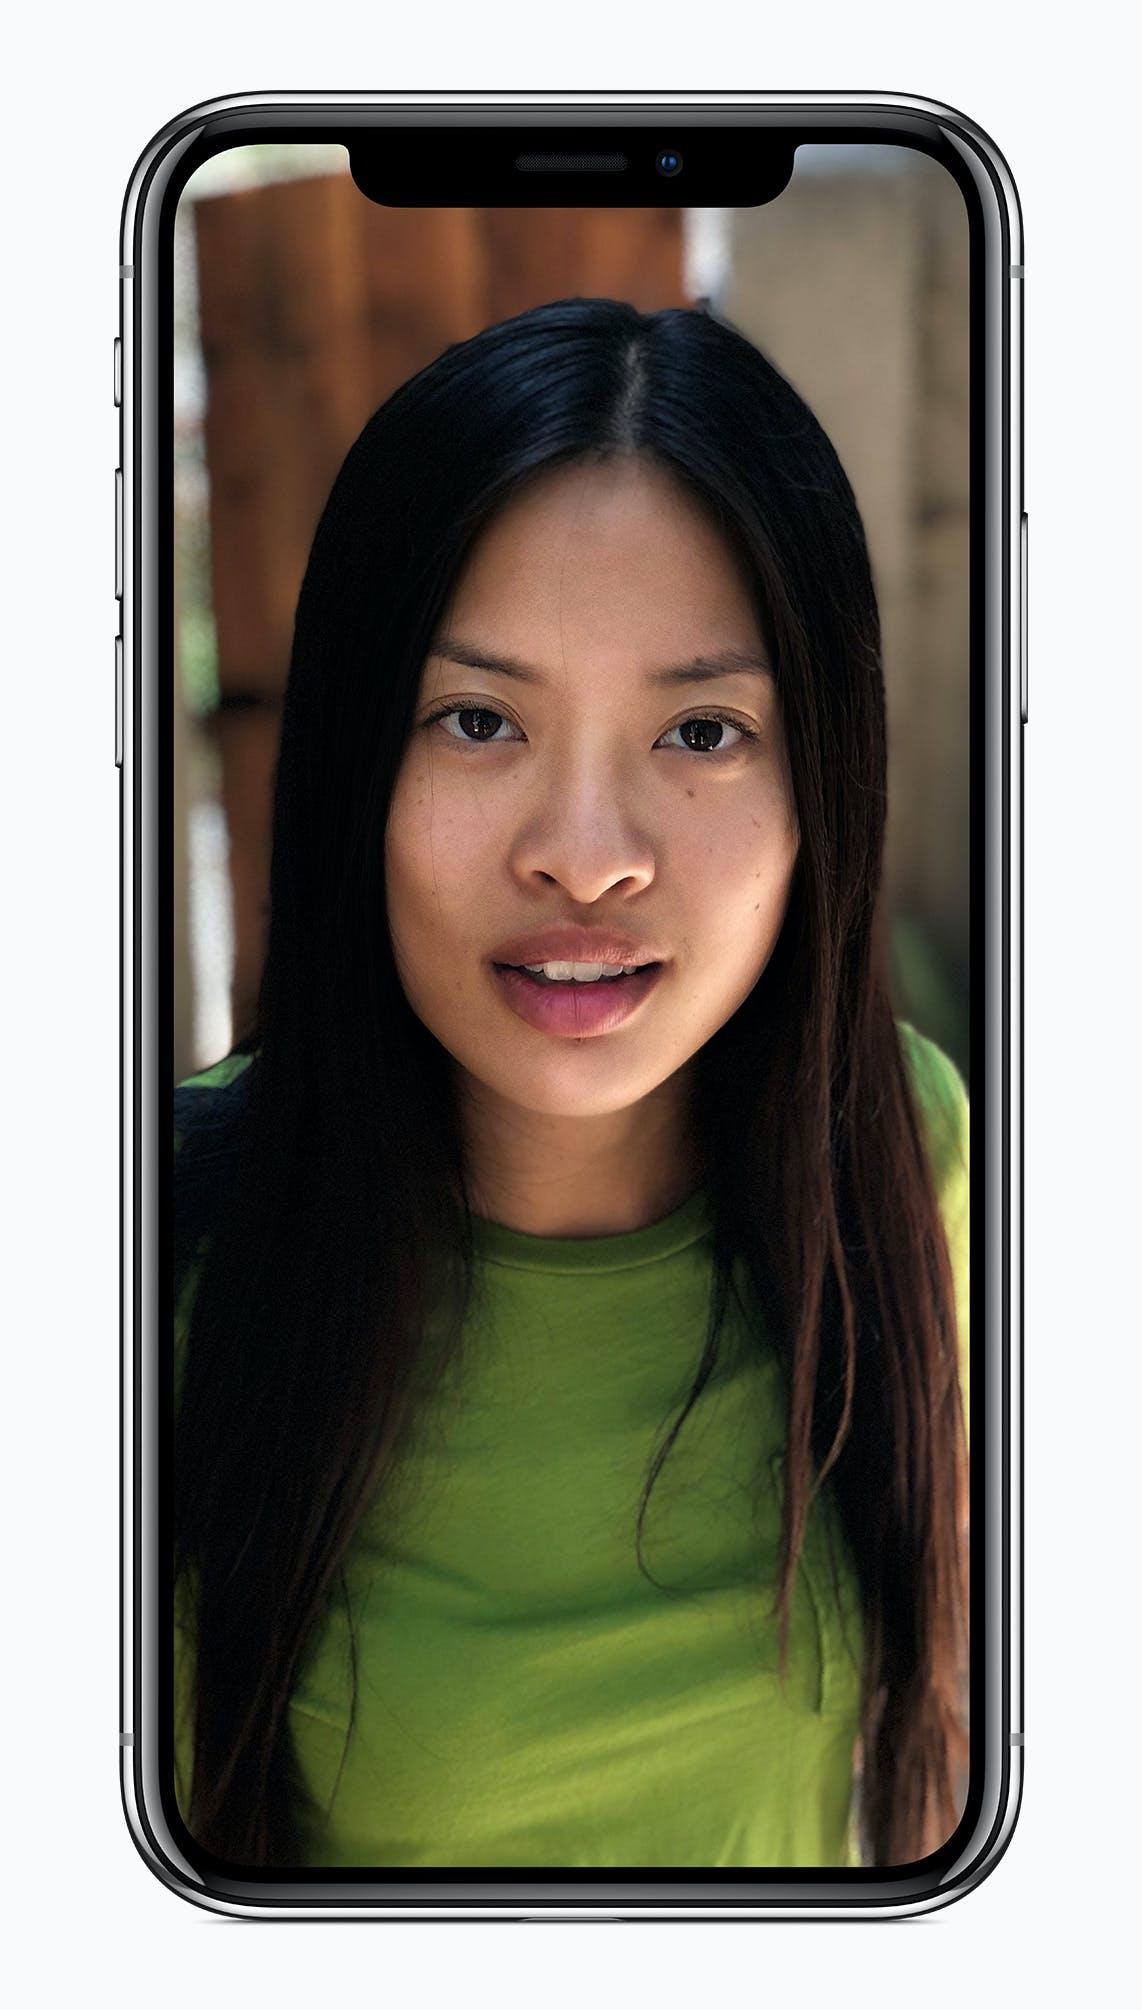 iPhone, iPhone X., 女孩, 手機 的 免費圖庫相片